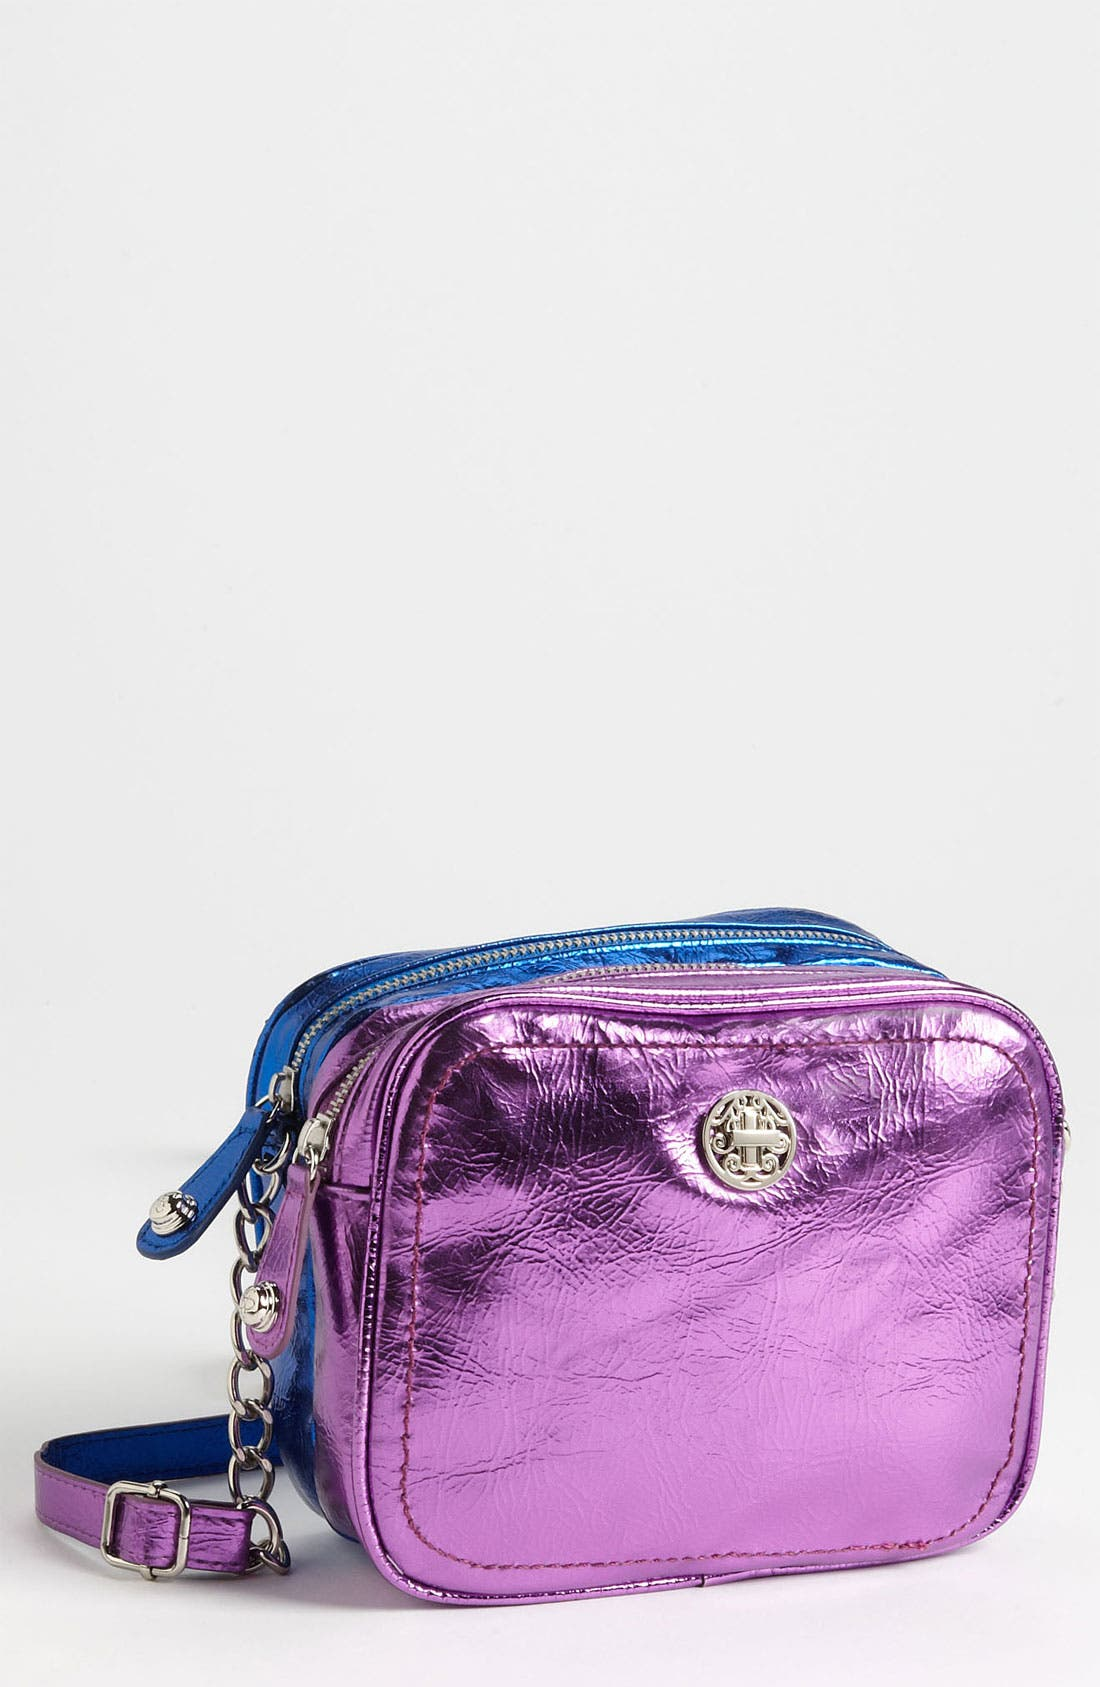 Alternate Image 1 Selected - Jessica Simpson 'Double Take' Crossbody Bag